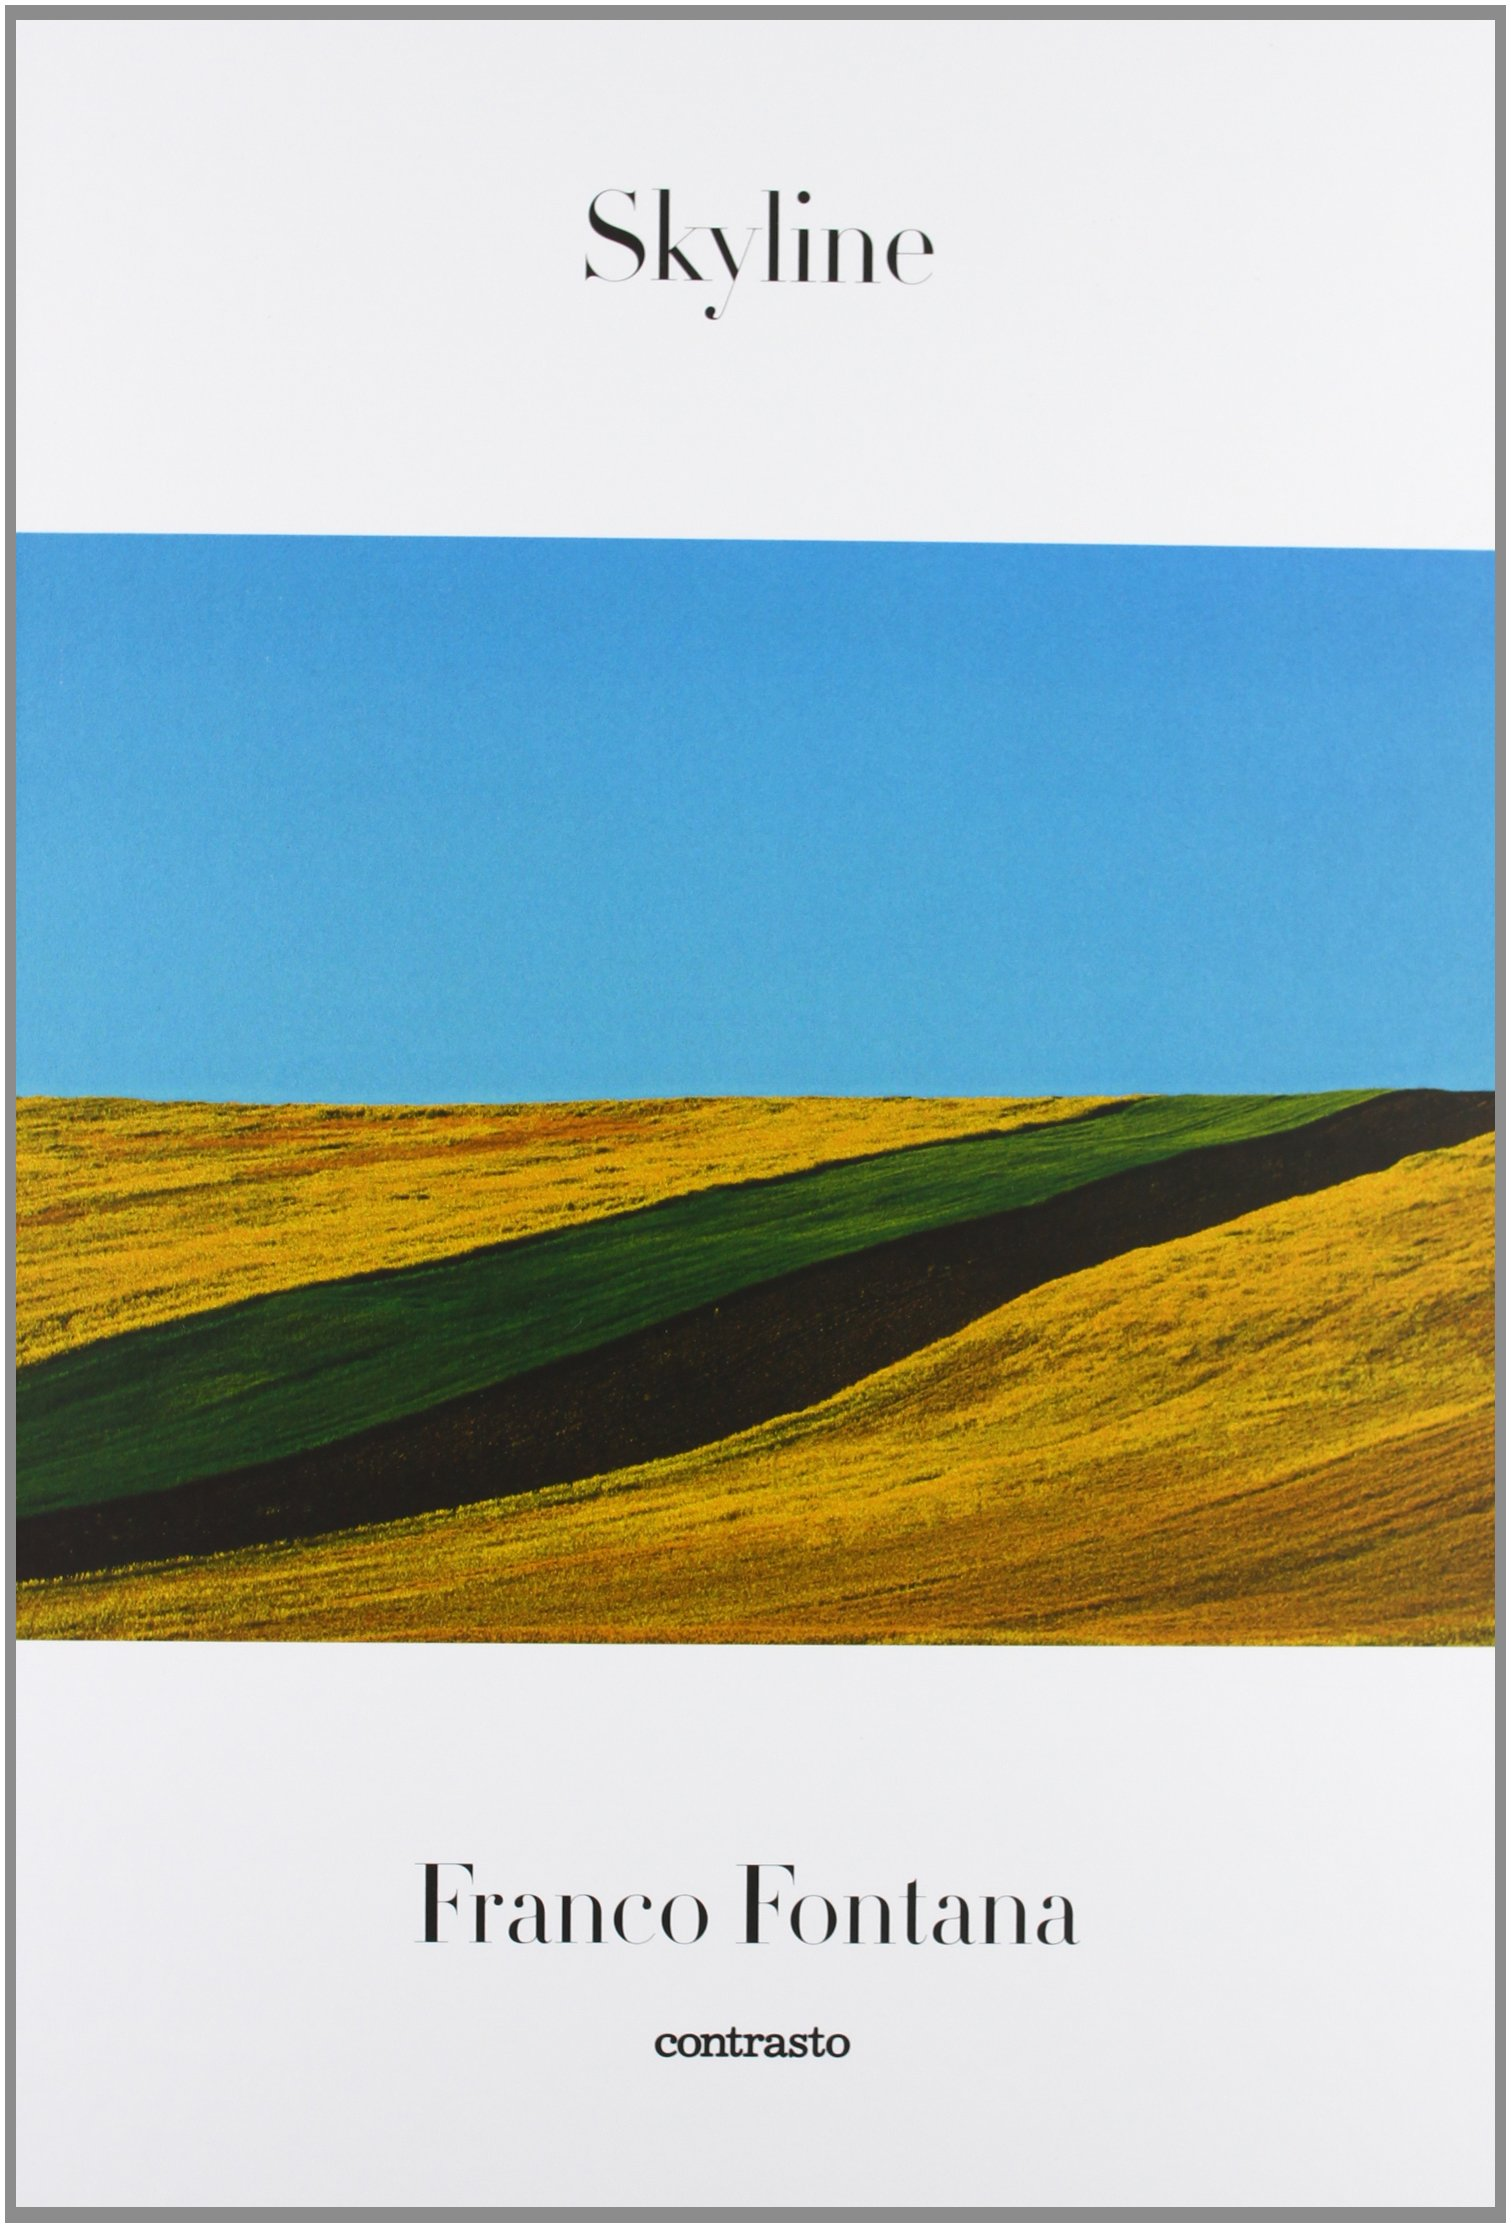 Skyline. Ediz. illustrata Copertina rigida – 21 nov 2013 Franco Fontana Contrasto 8869654893 Altra illustrata